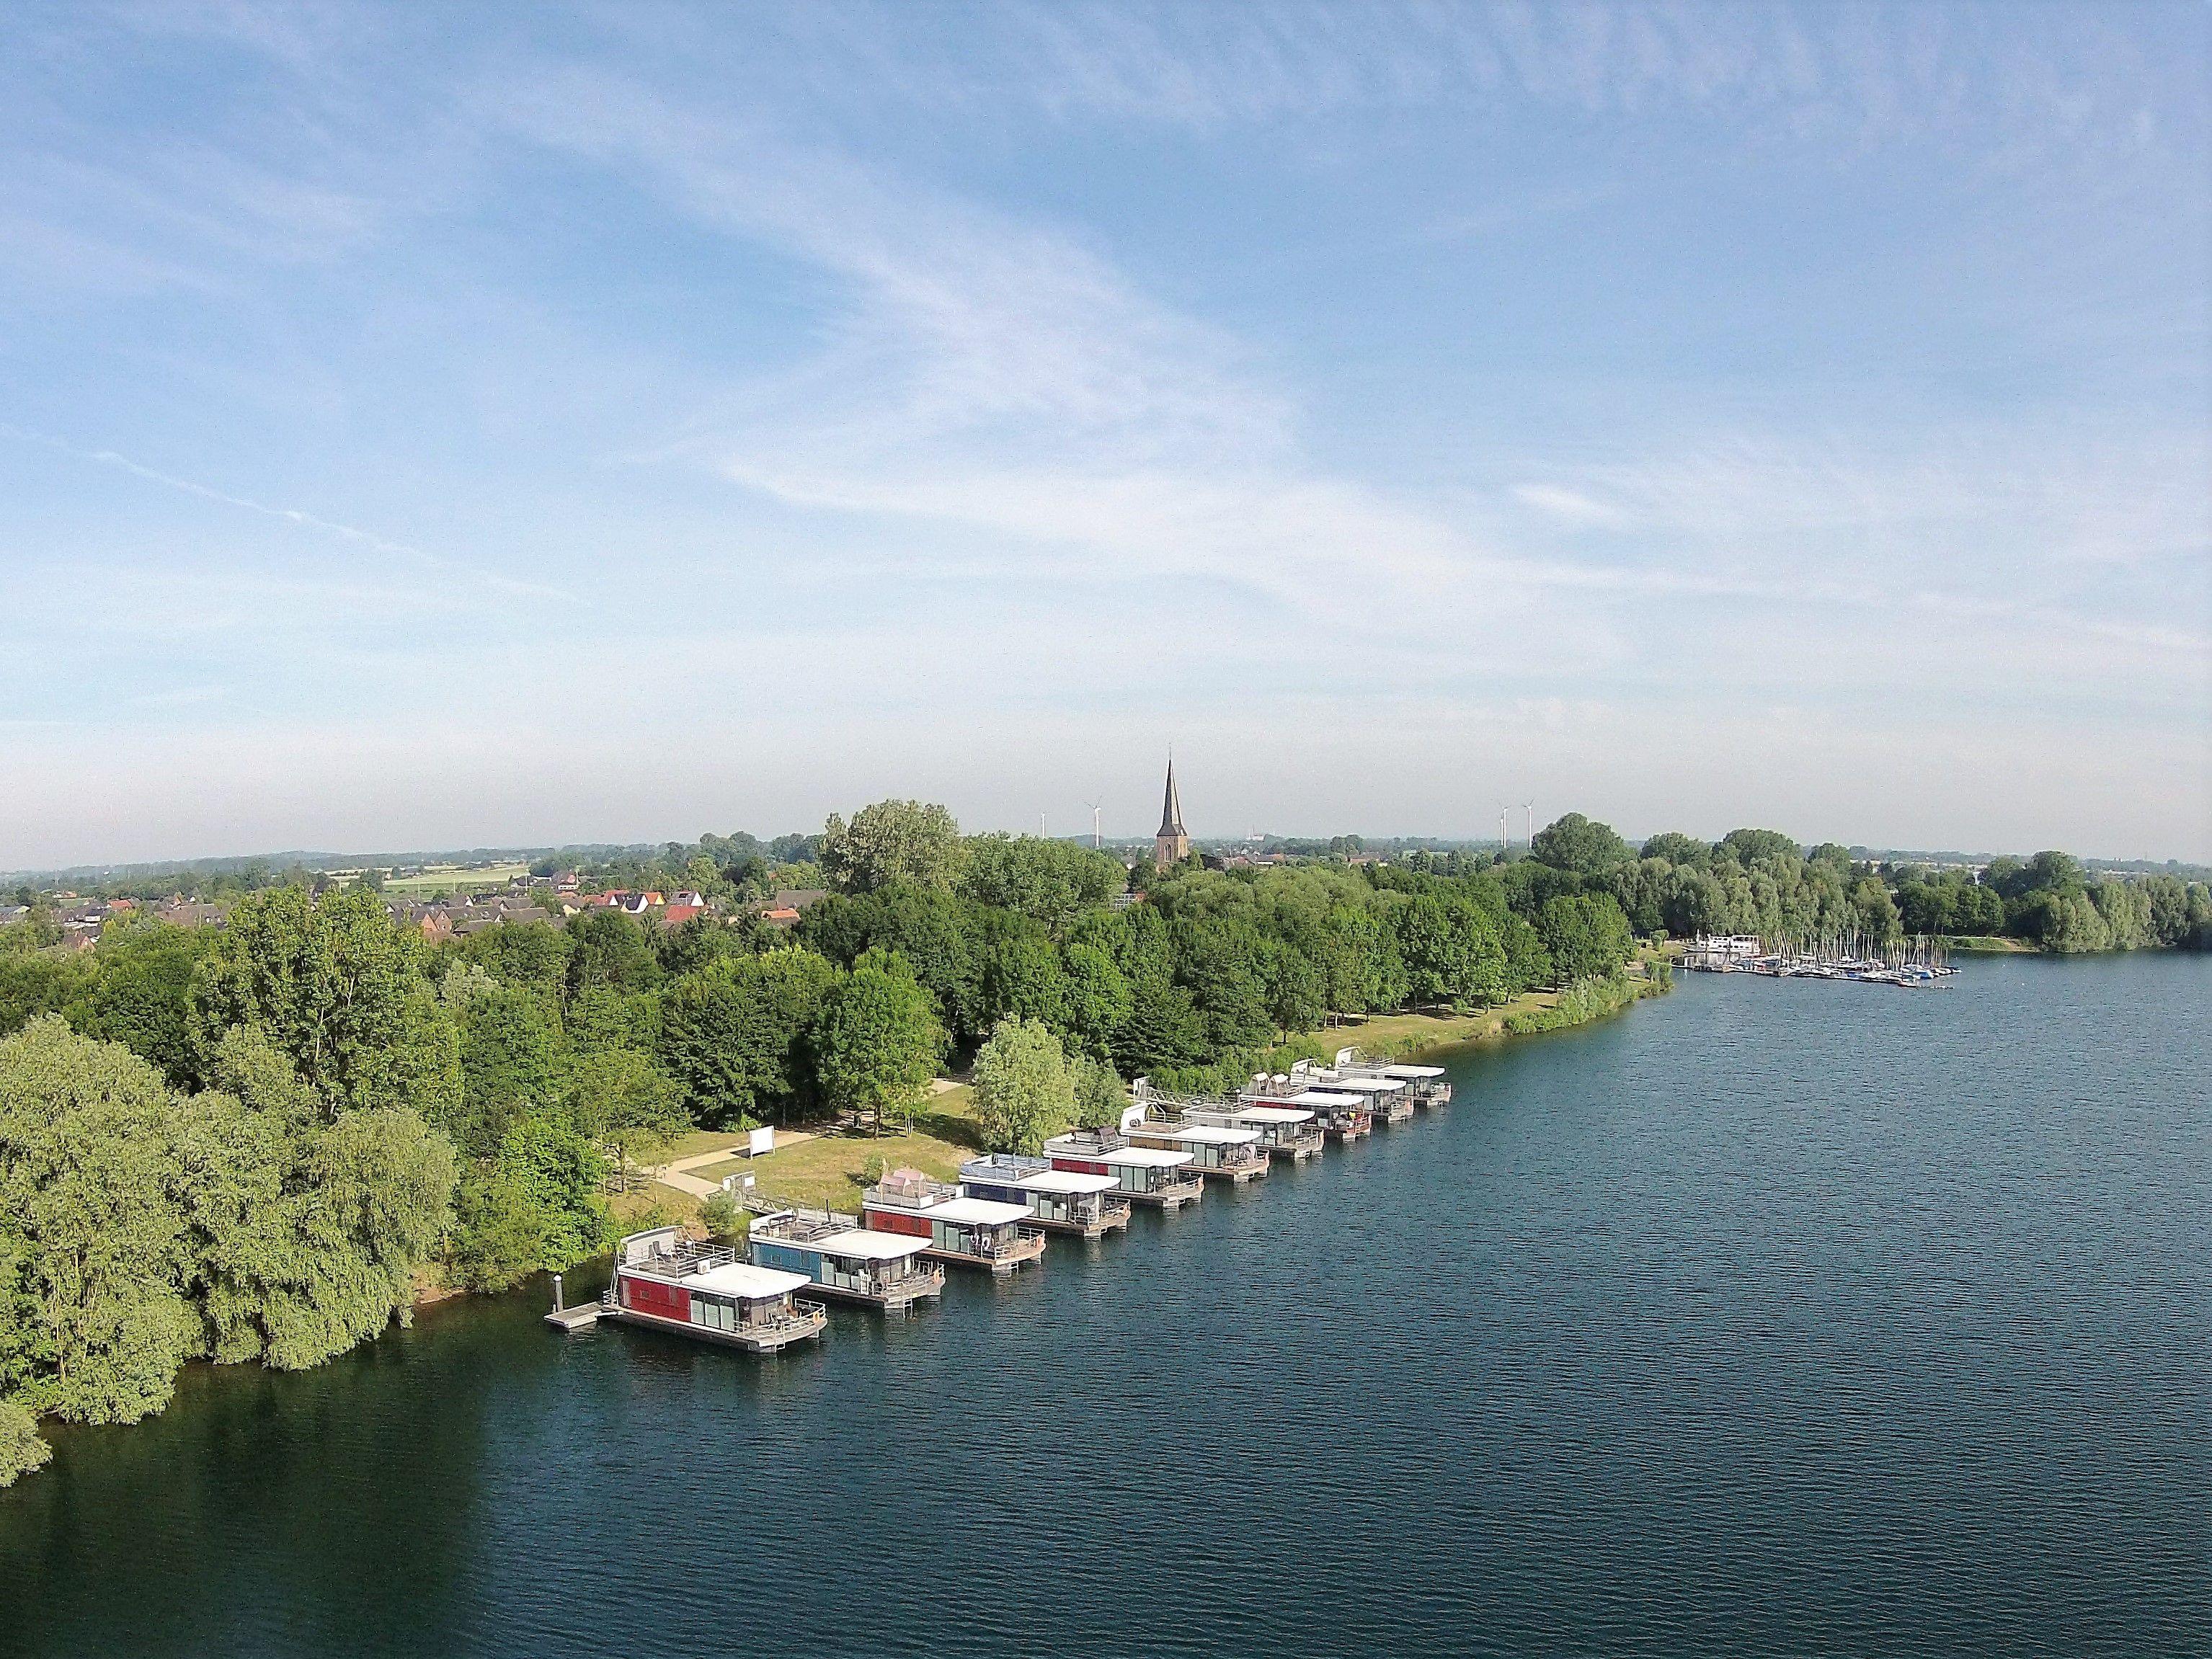 Hausboot, Hausbooturlaub, Ferienhaus floating house